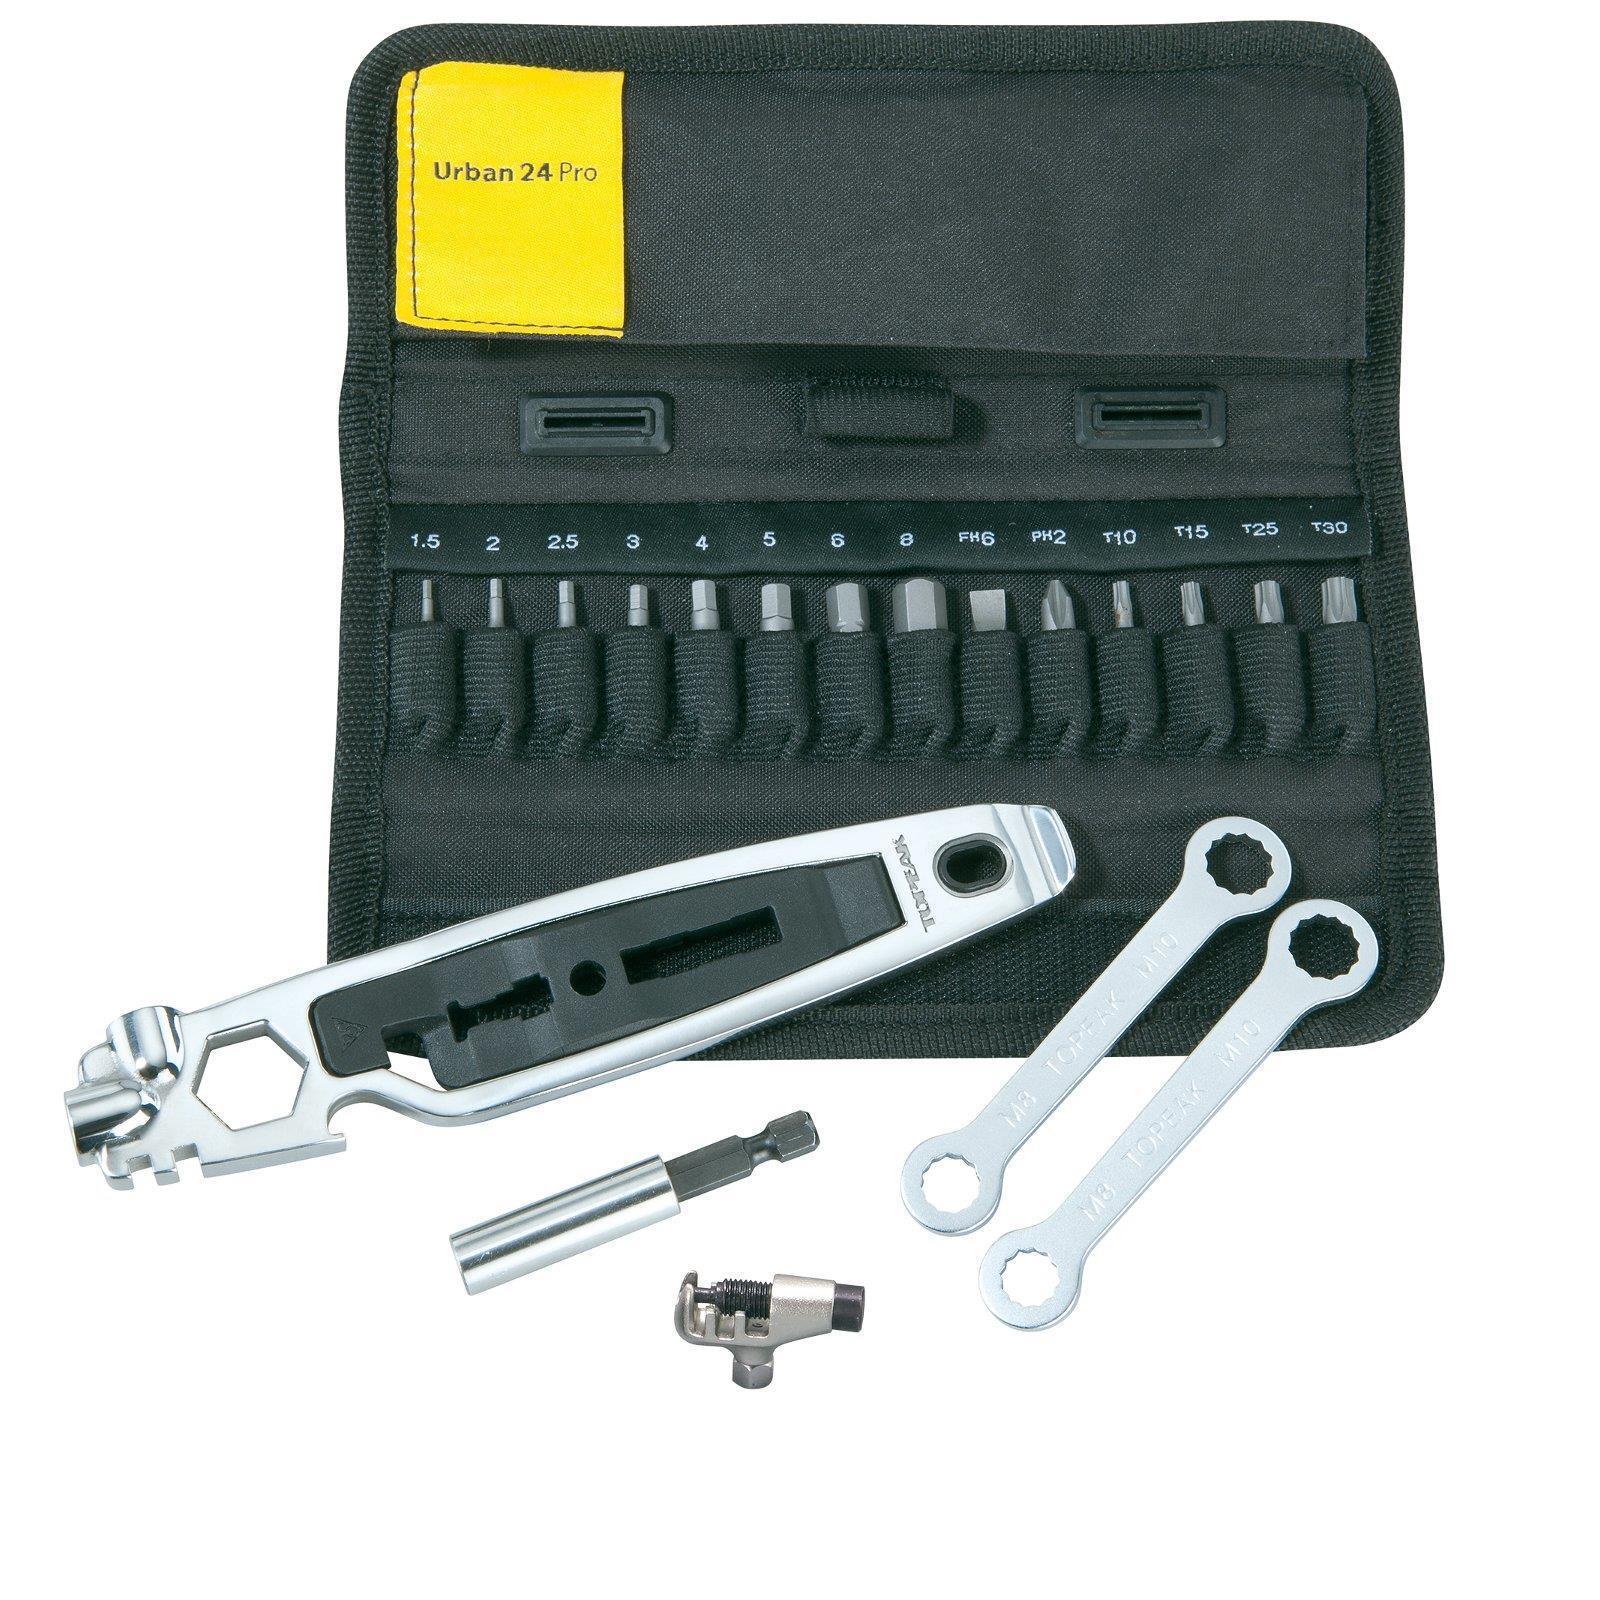 Topeak Prep 25 funciones herramienta de acero inoxidable multi herramienta profesional set bolsa tt2553